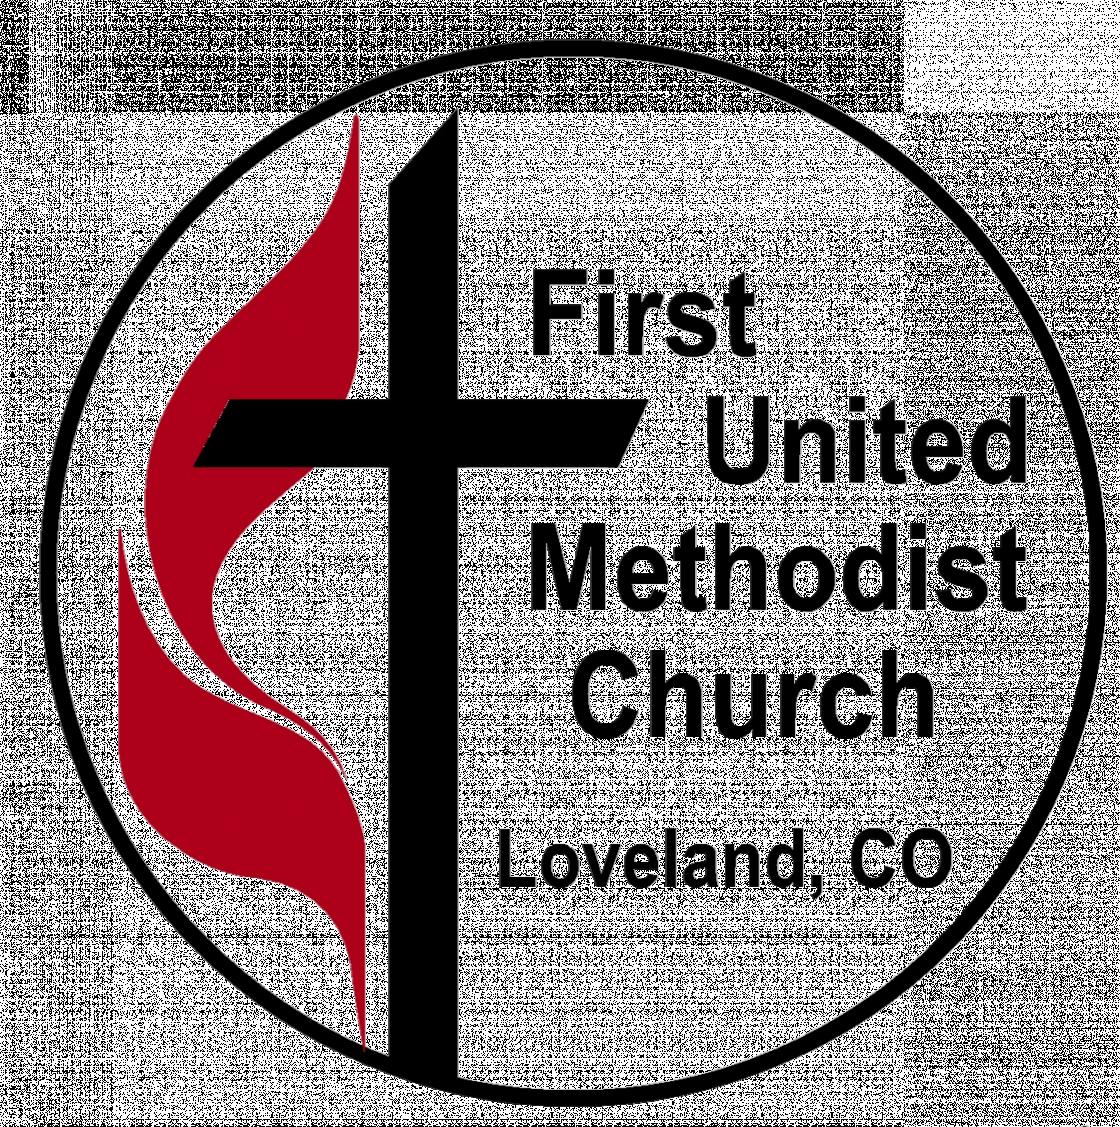 LOGO: First United Methodist Church, Loveland, CO